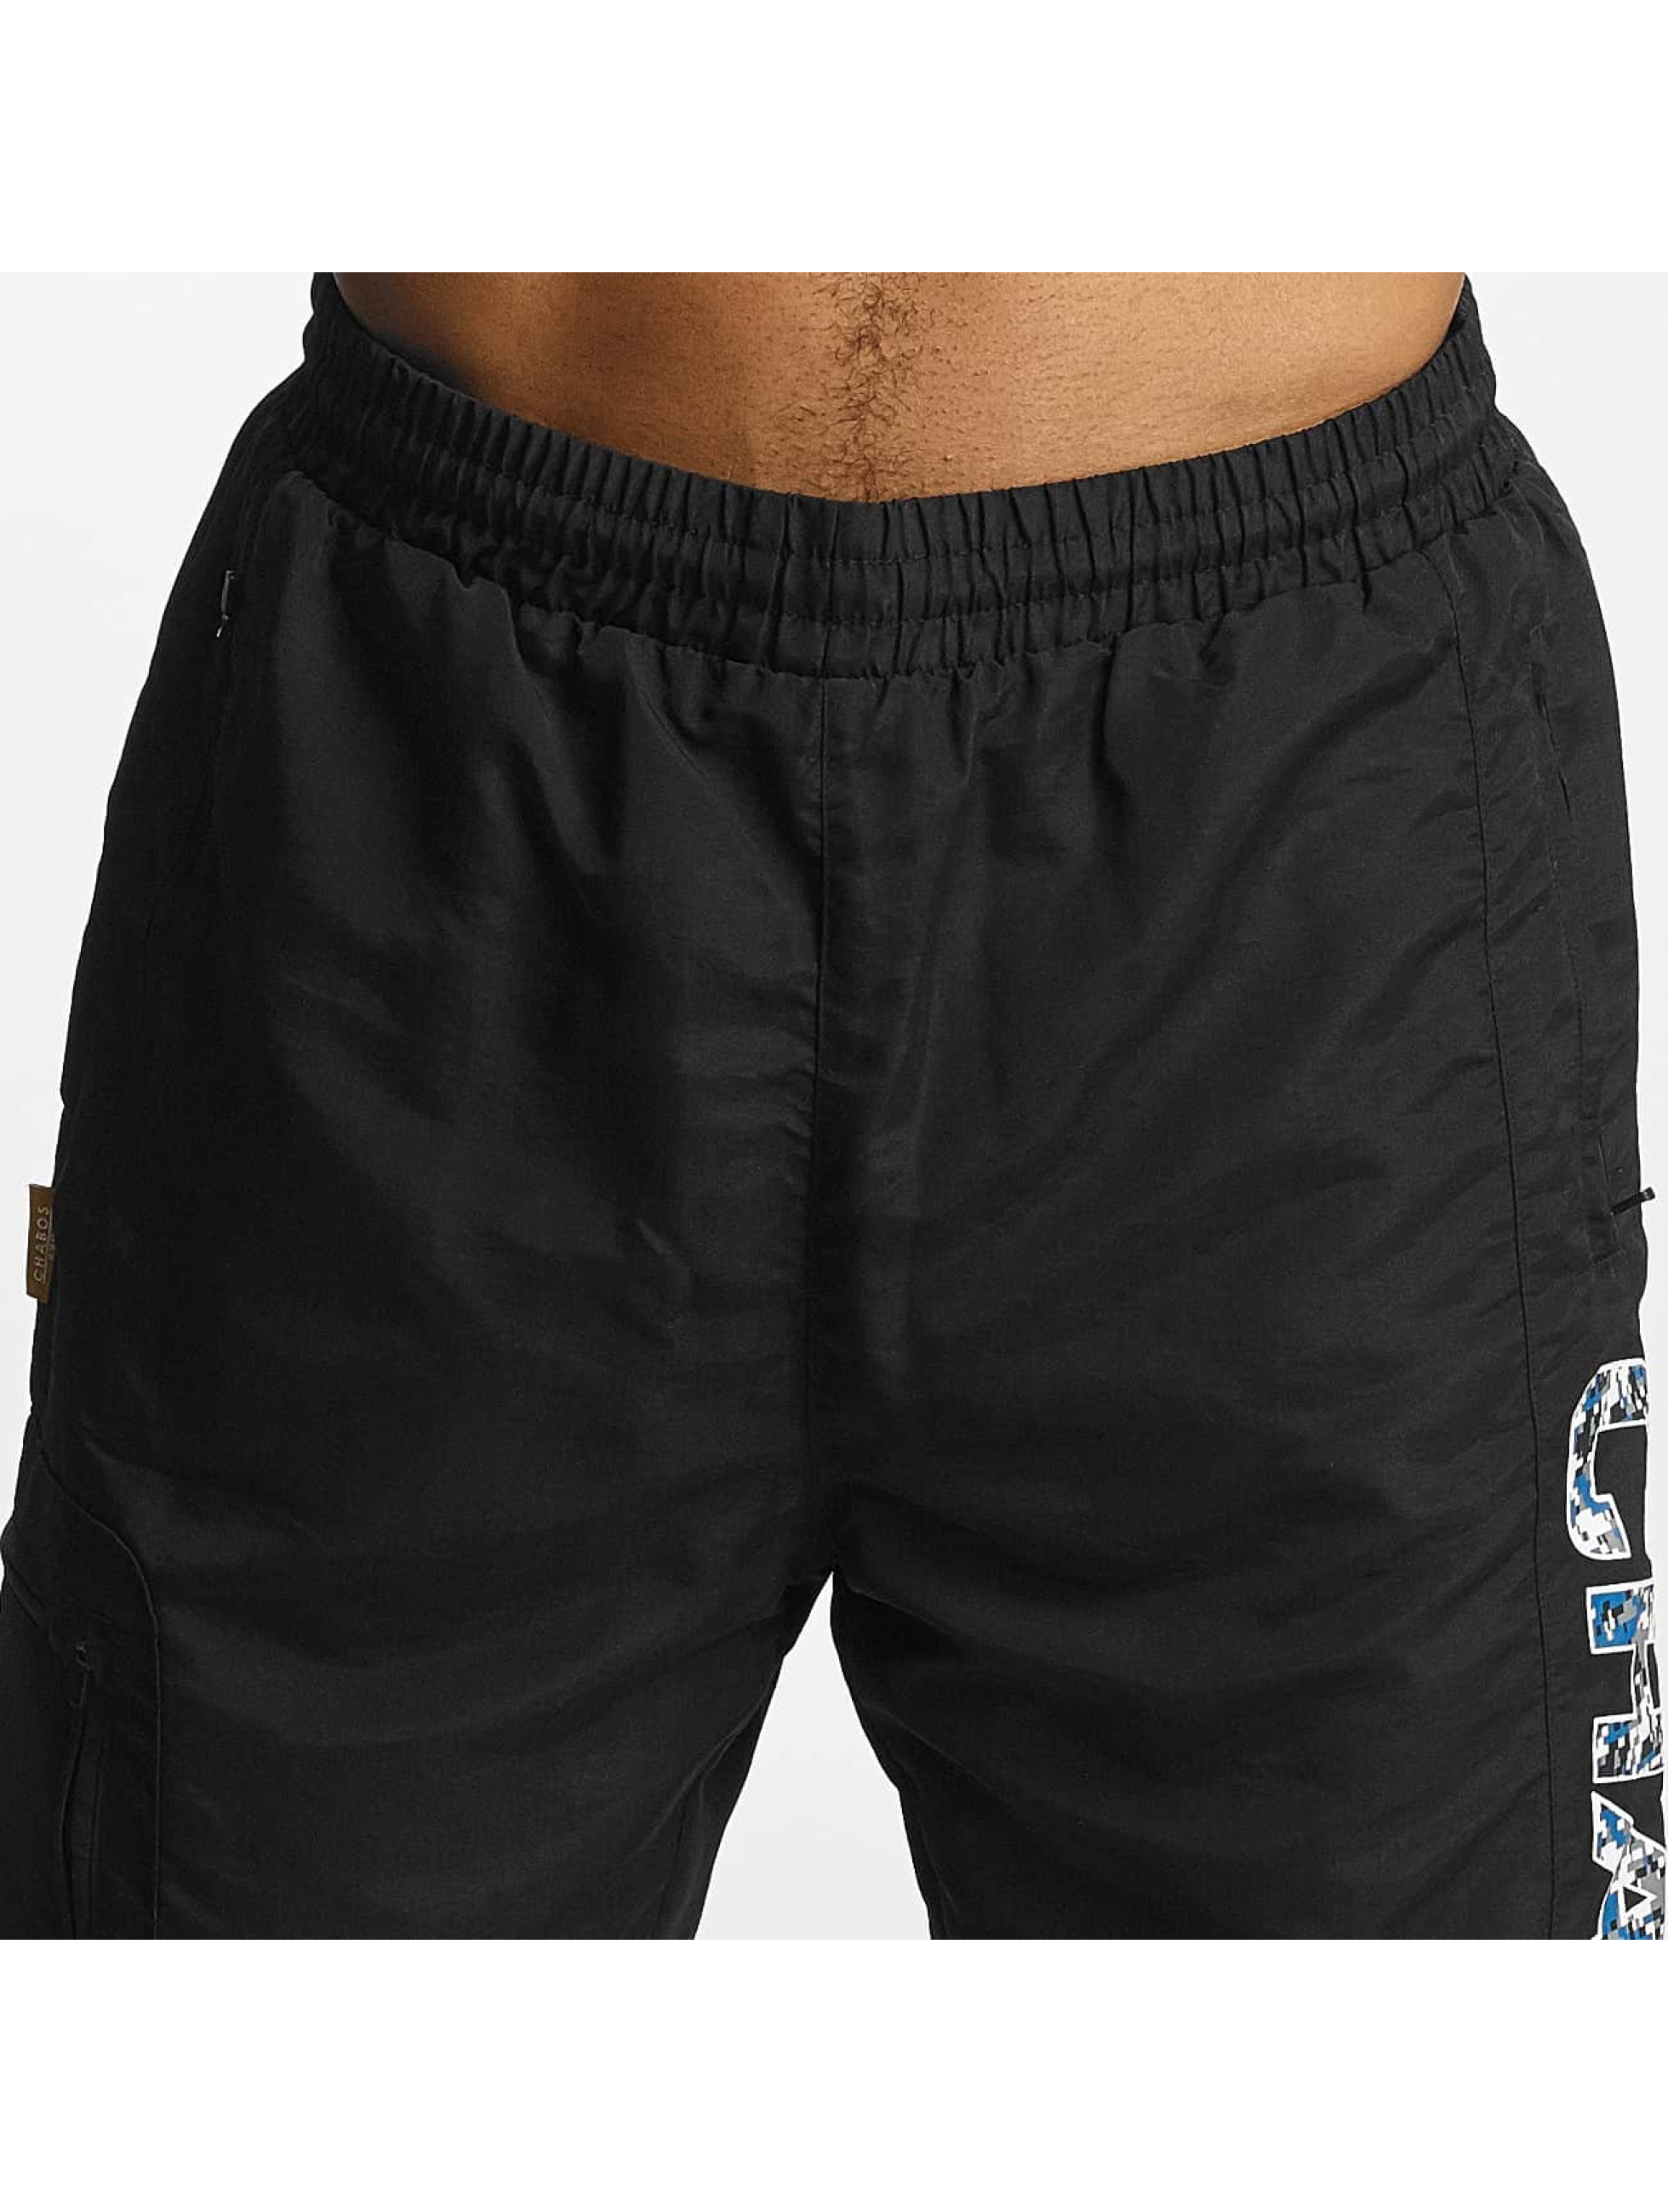 CHABOS IIVII Spodnie do joggingu Pafpaf czarny